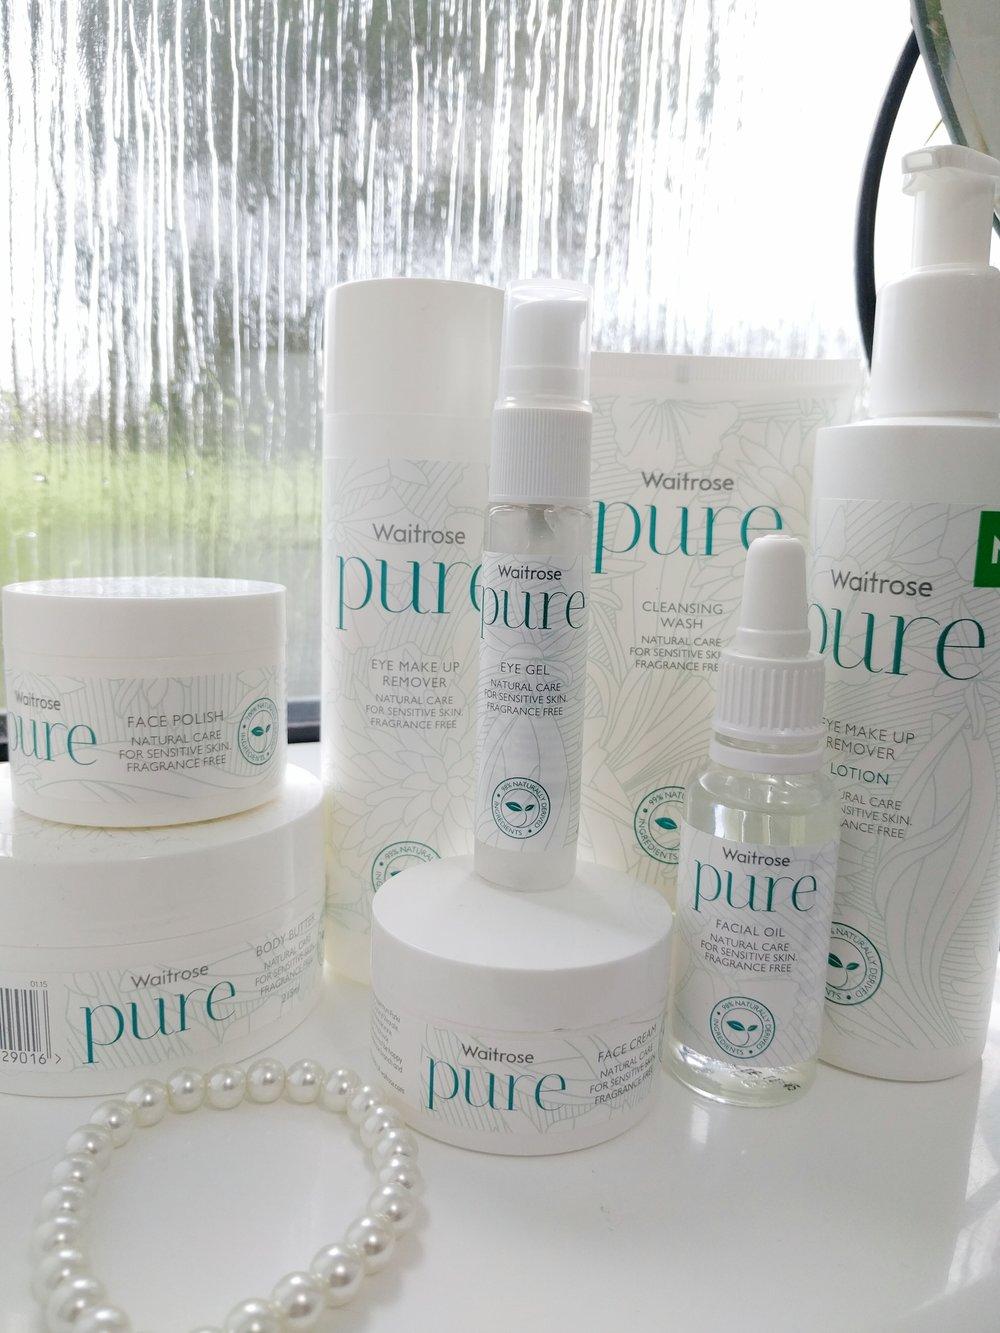 Waitrose Pure skincare image 1.jpg